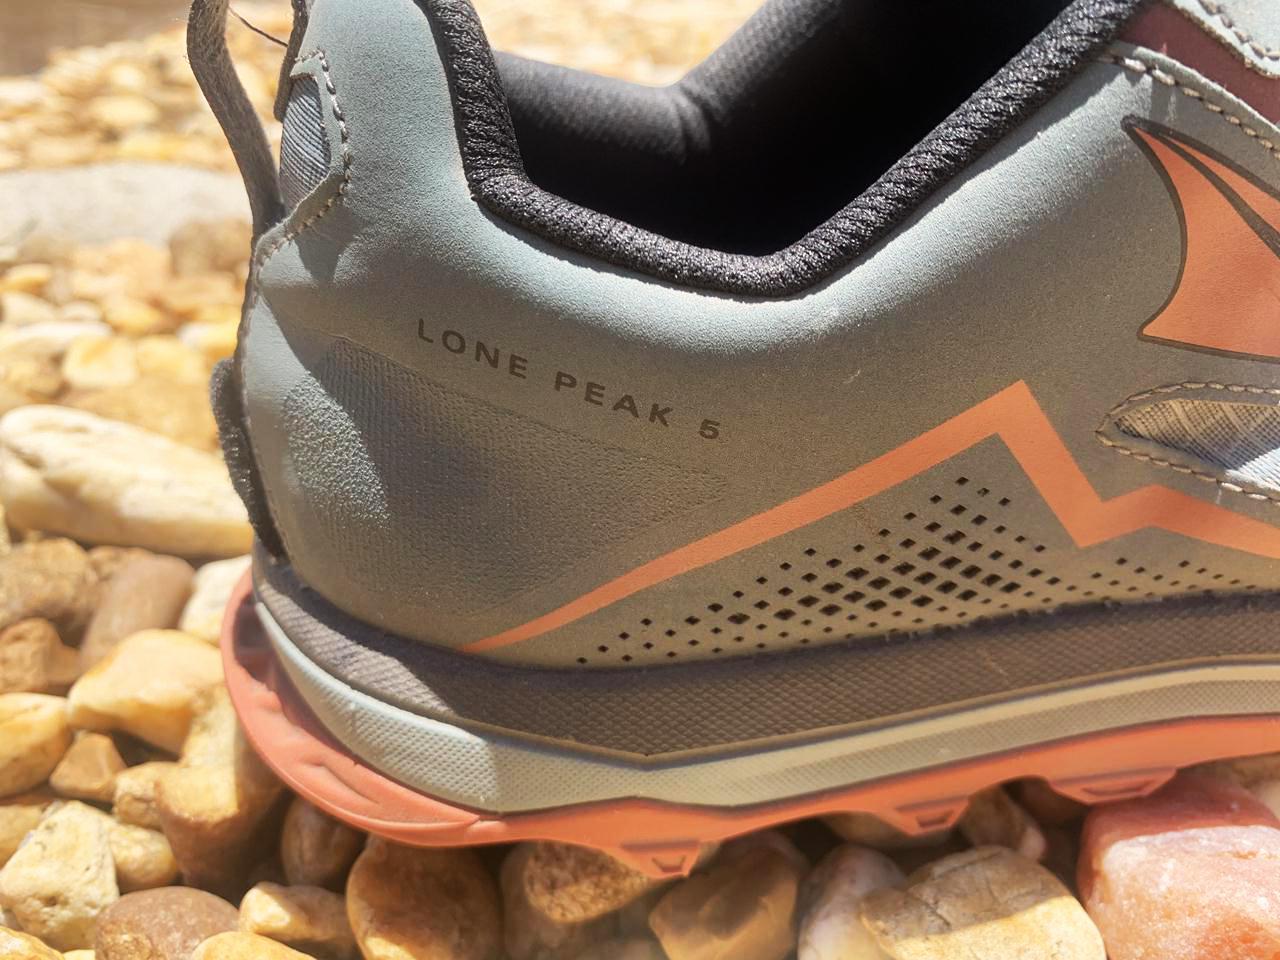 Altra Lone Peak 5.0 - Closeup Heel